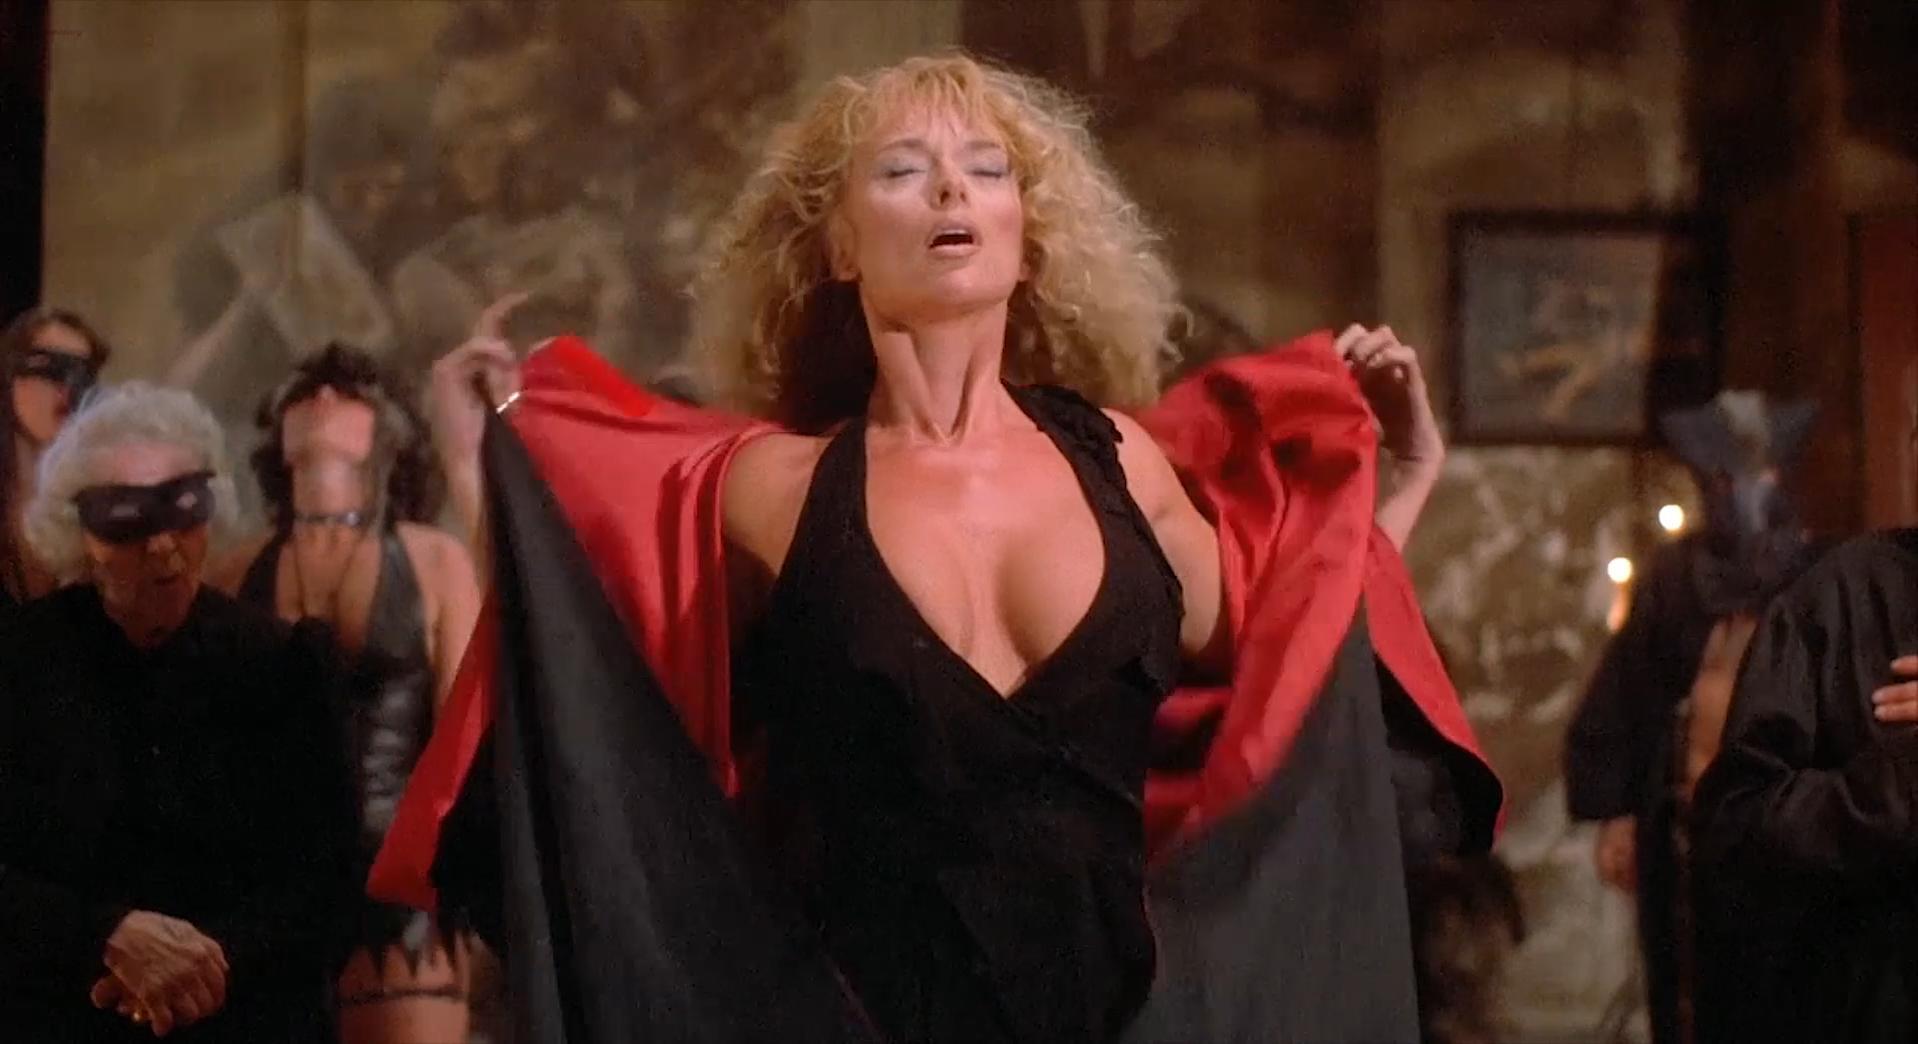 Sybil Danning nude, Marsha A. Hunt nude - Howling 2 (1985)